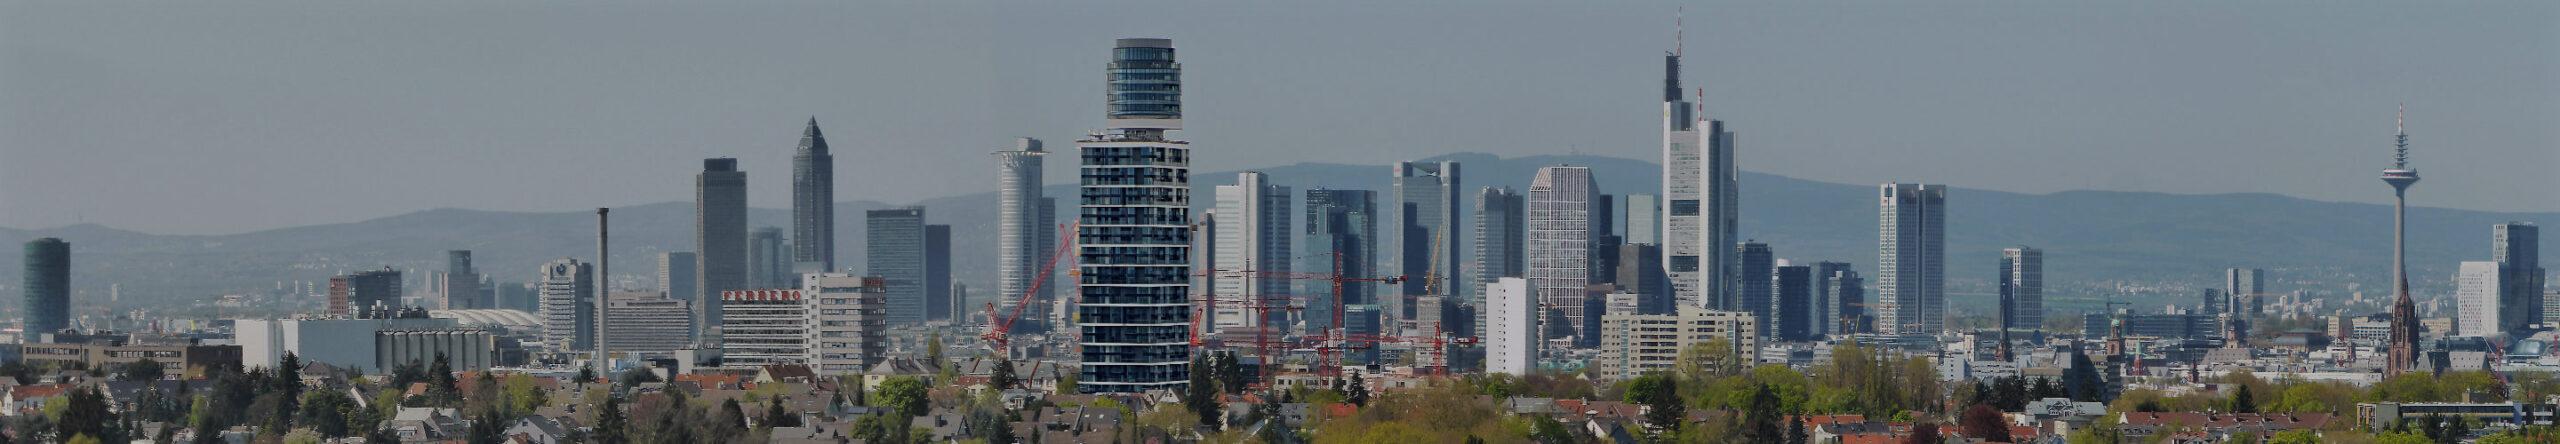 Bastelvorlage Frankfurt am Main - Frankfurt Skyline - Hochhäuser Frankfurt - Wolkenkratzer Frankfurt - Architektur basteln